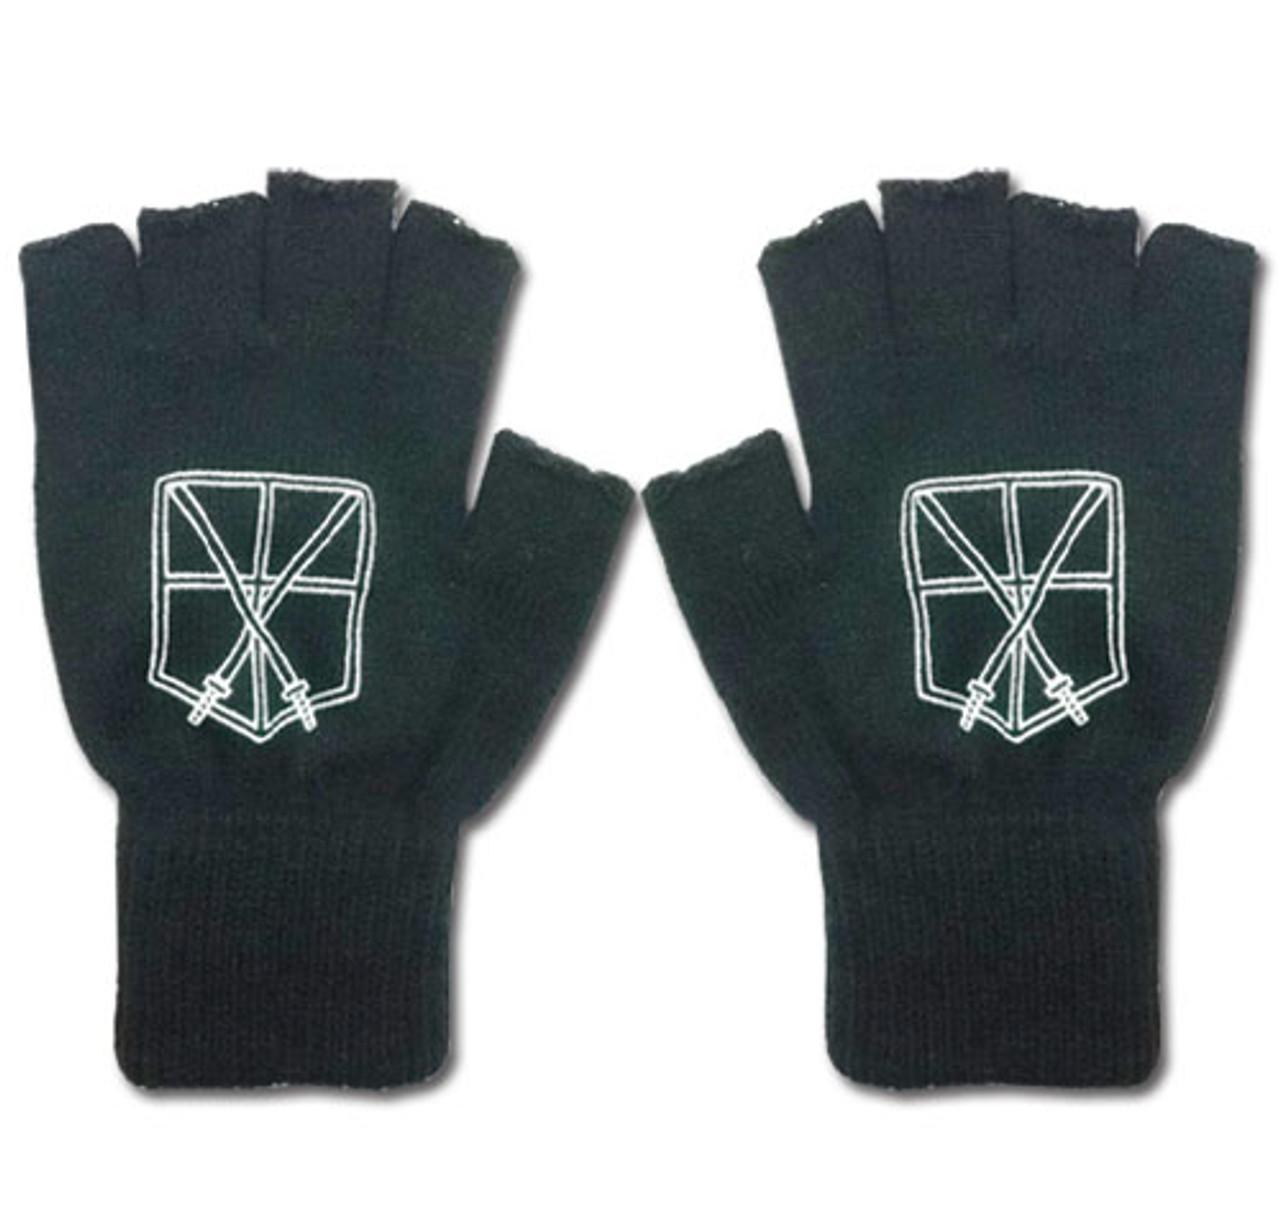 Attack On Titan Cadet Corps Gloves